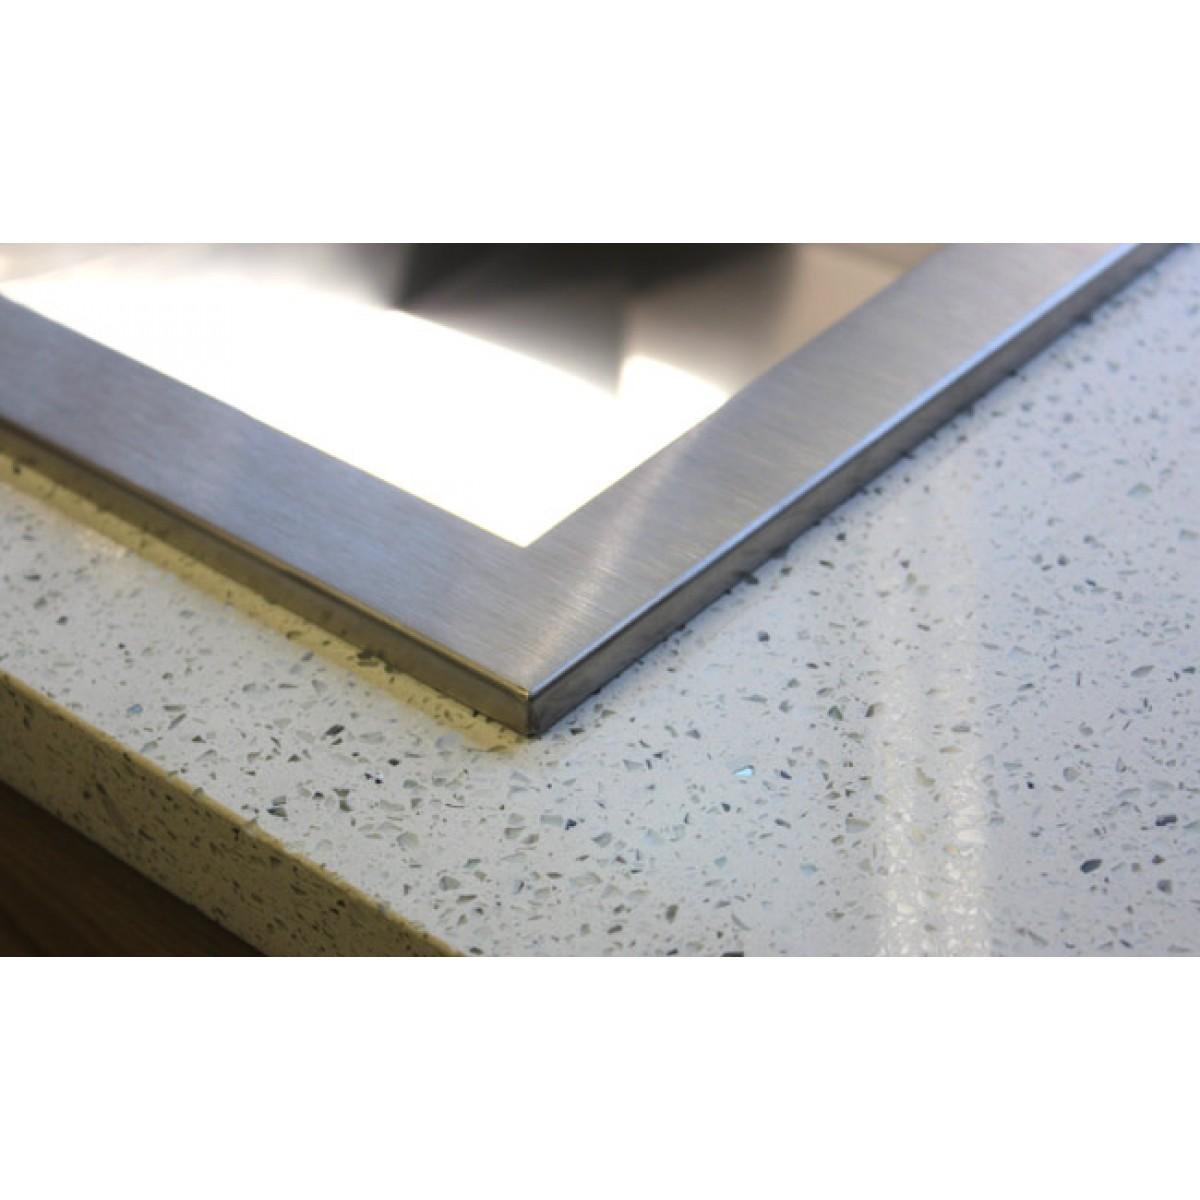 Drop In Stainless Steel Kitchen Sinks 36 inch top-mount / drop-in stainless steel double bowl kitchen sink